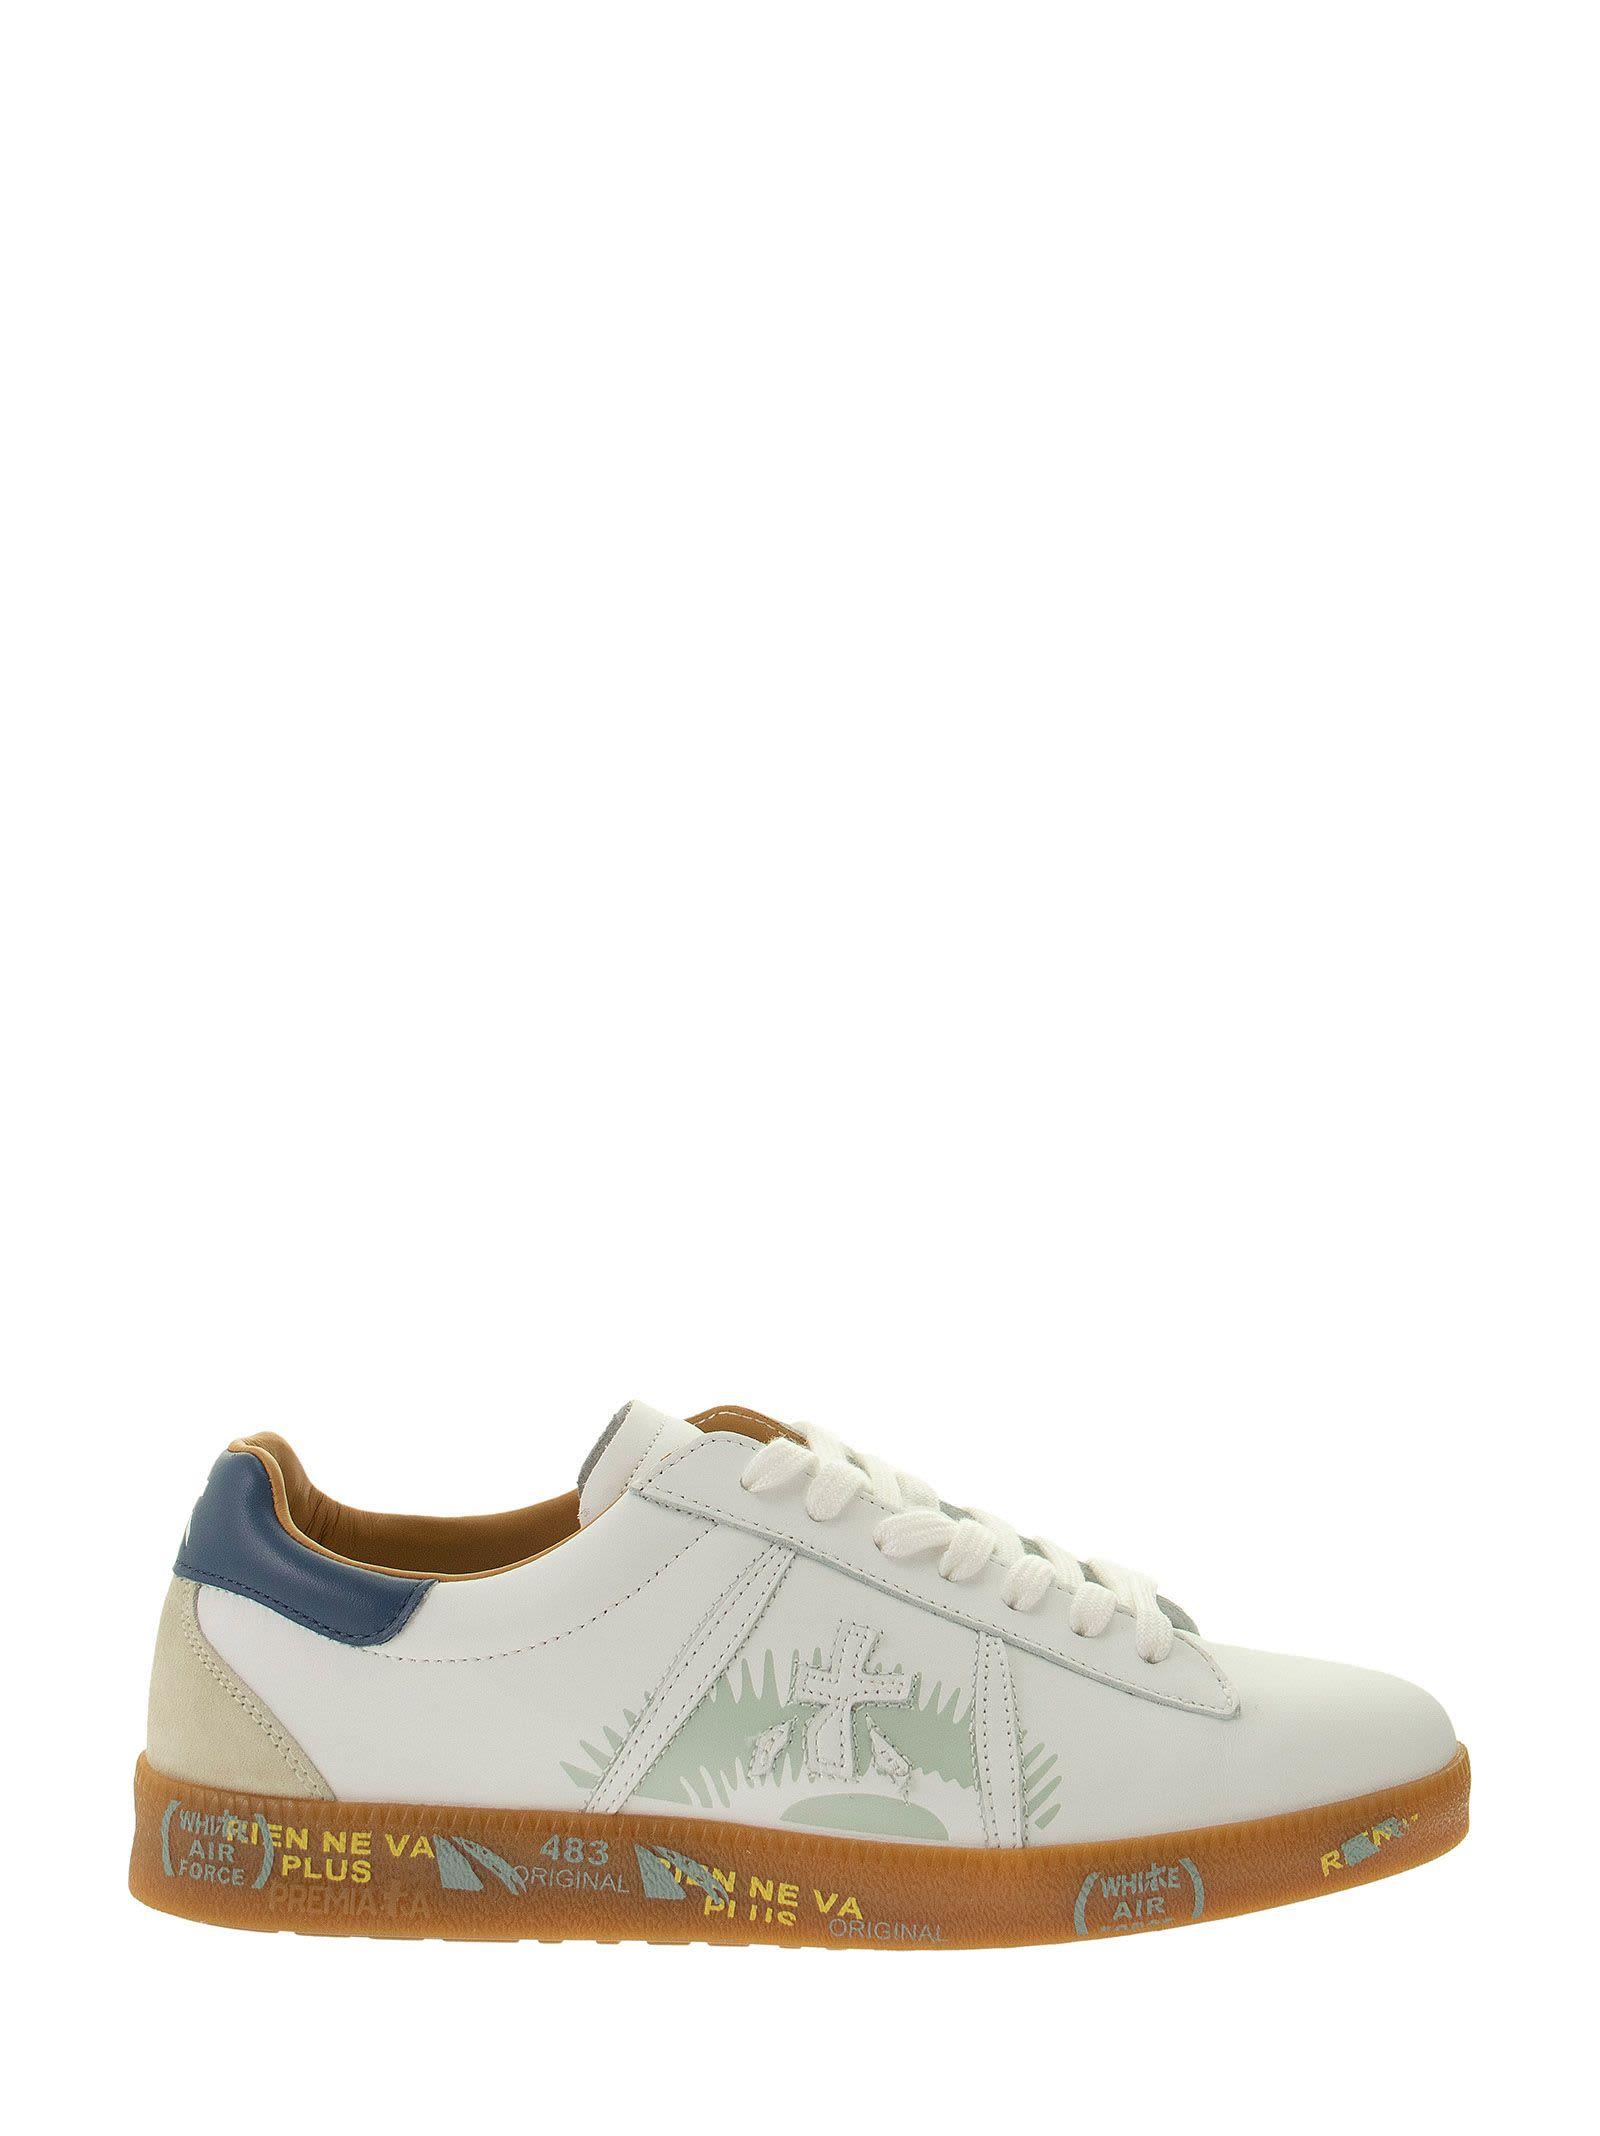 Premiata Andy 5138 Sneakers